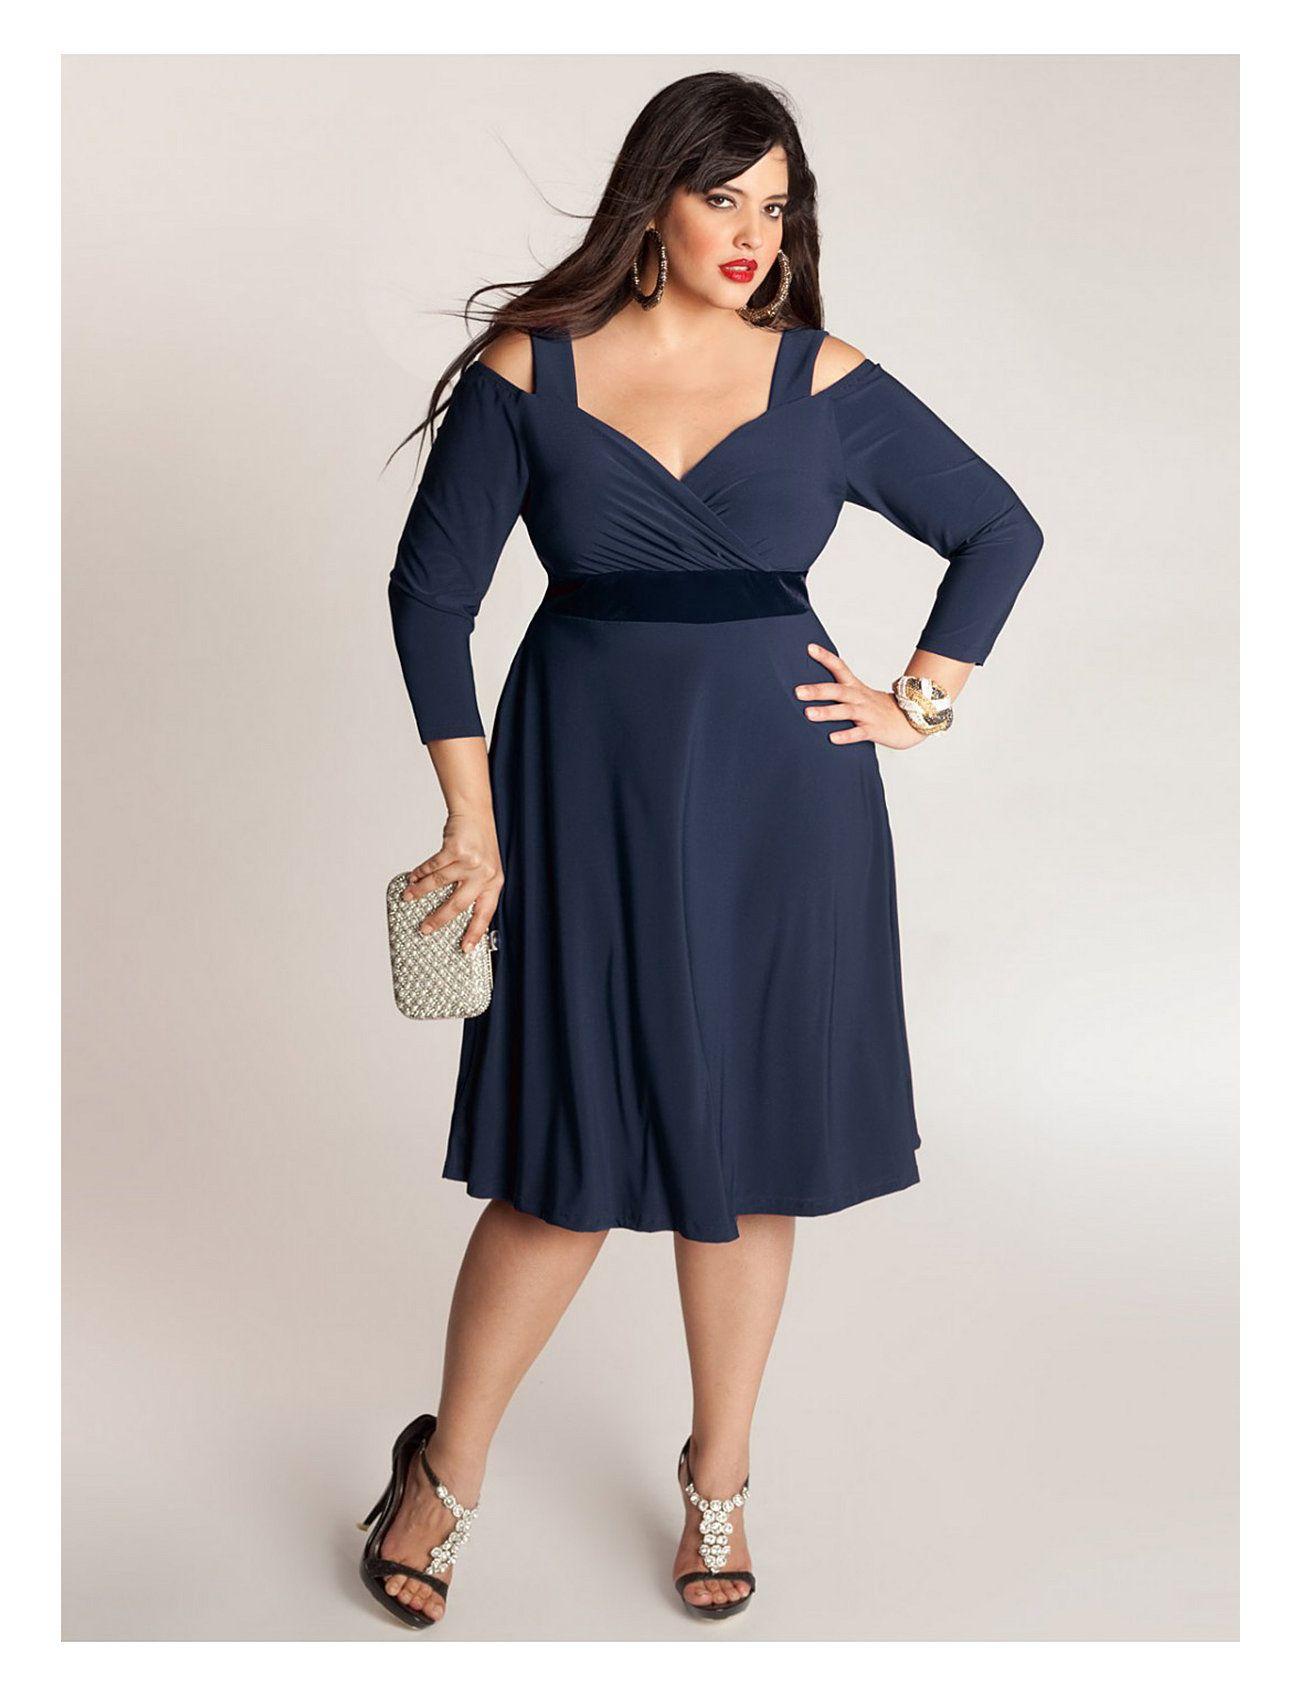 Plus size bridesmaid dresses u dresses for wedding guests sonsi